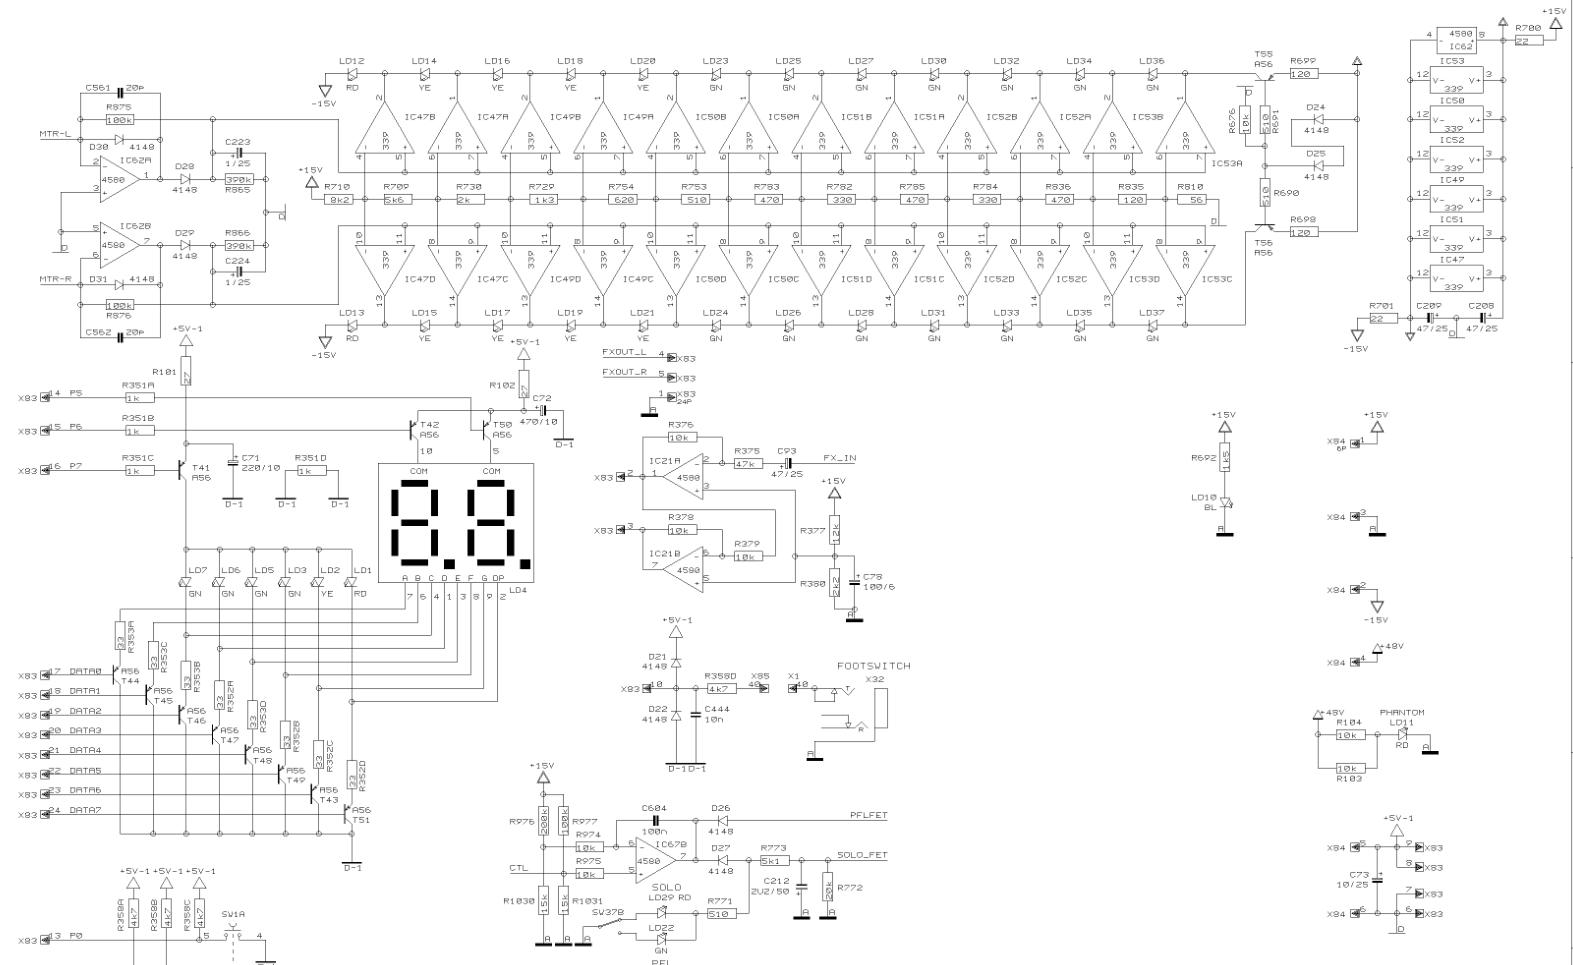 Behringer XENYX X2222USB vu-meters repair and inside teardown ...